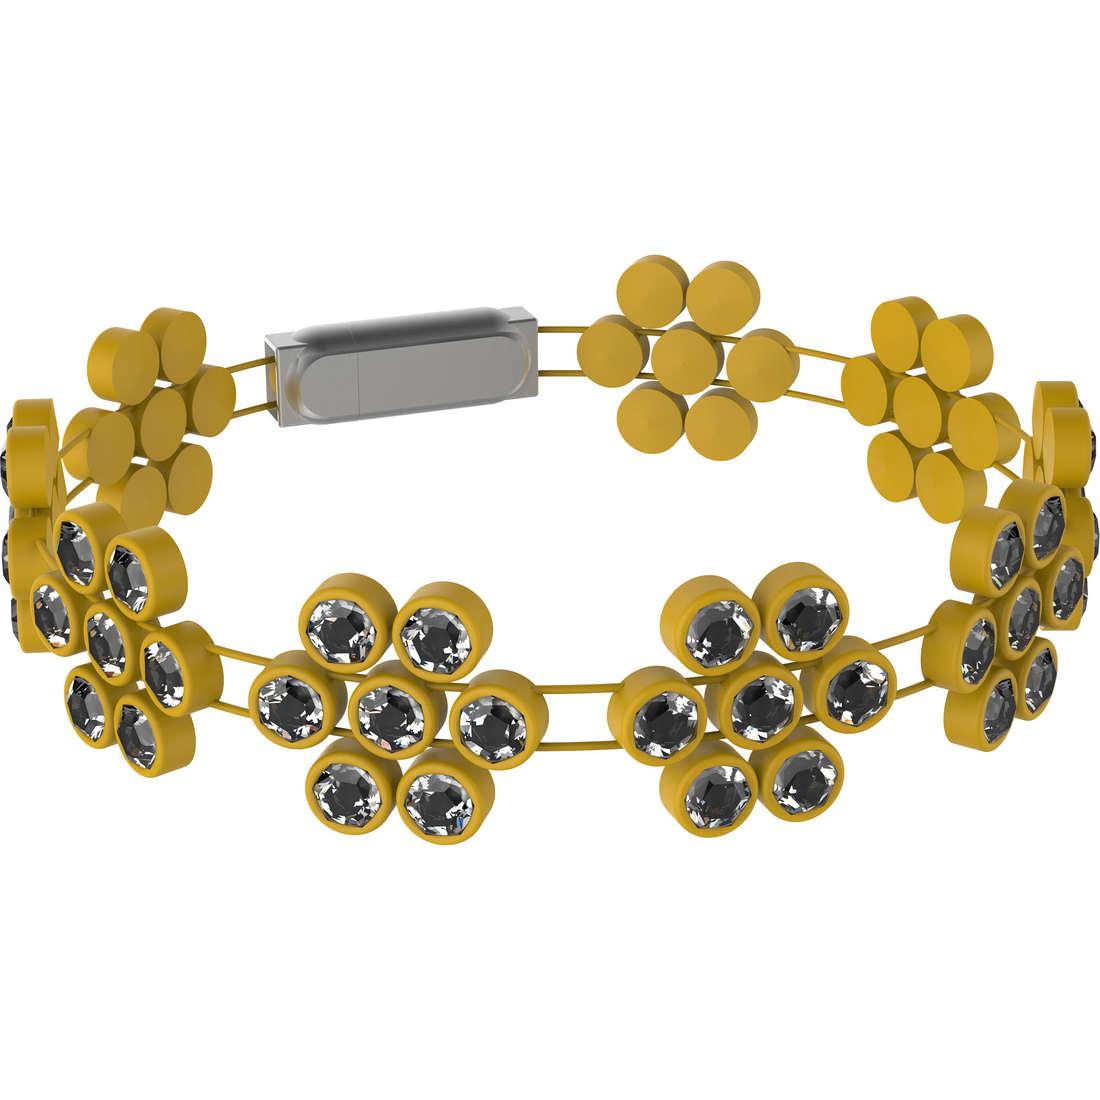 bracelet woman jewellery Too late 8052145223143